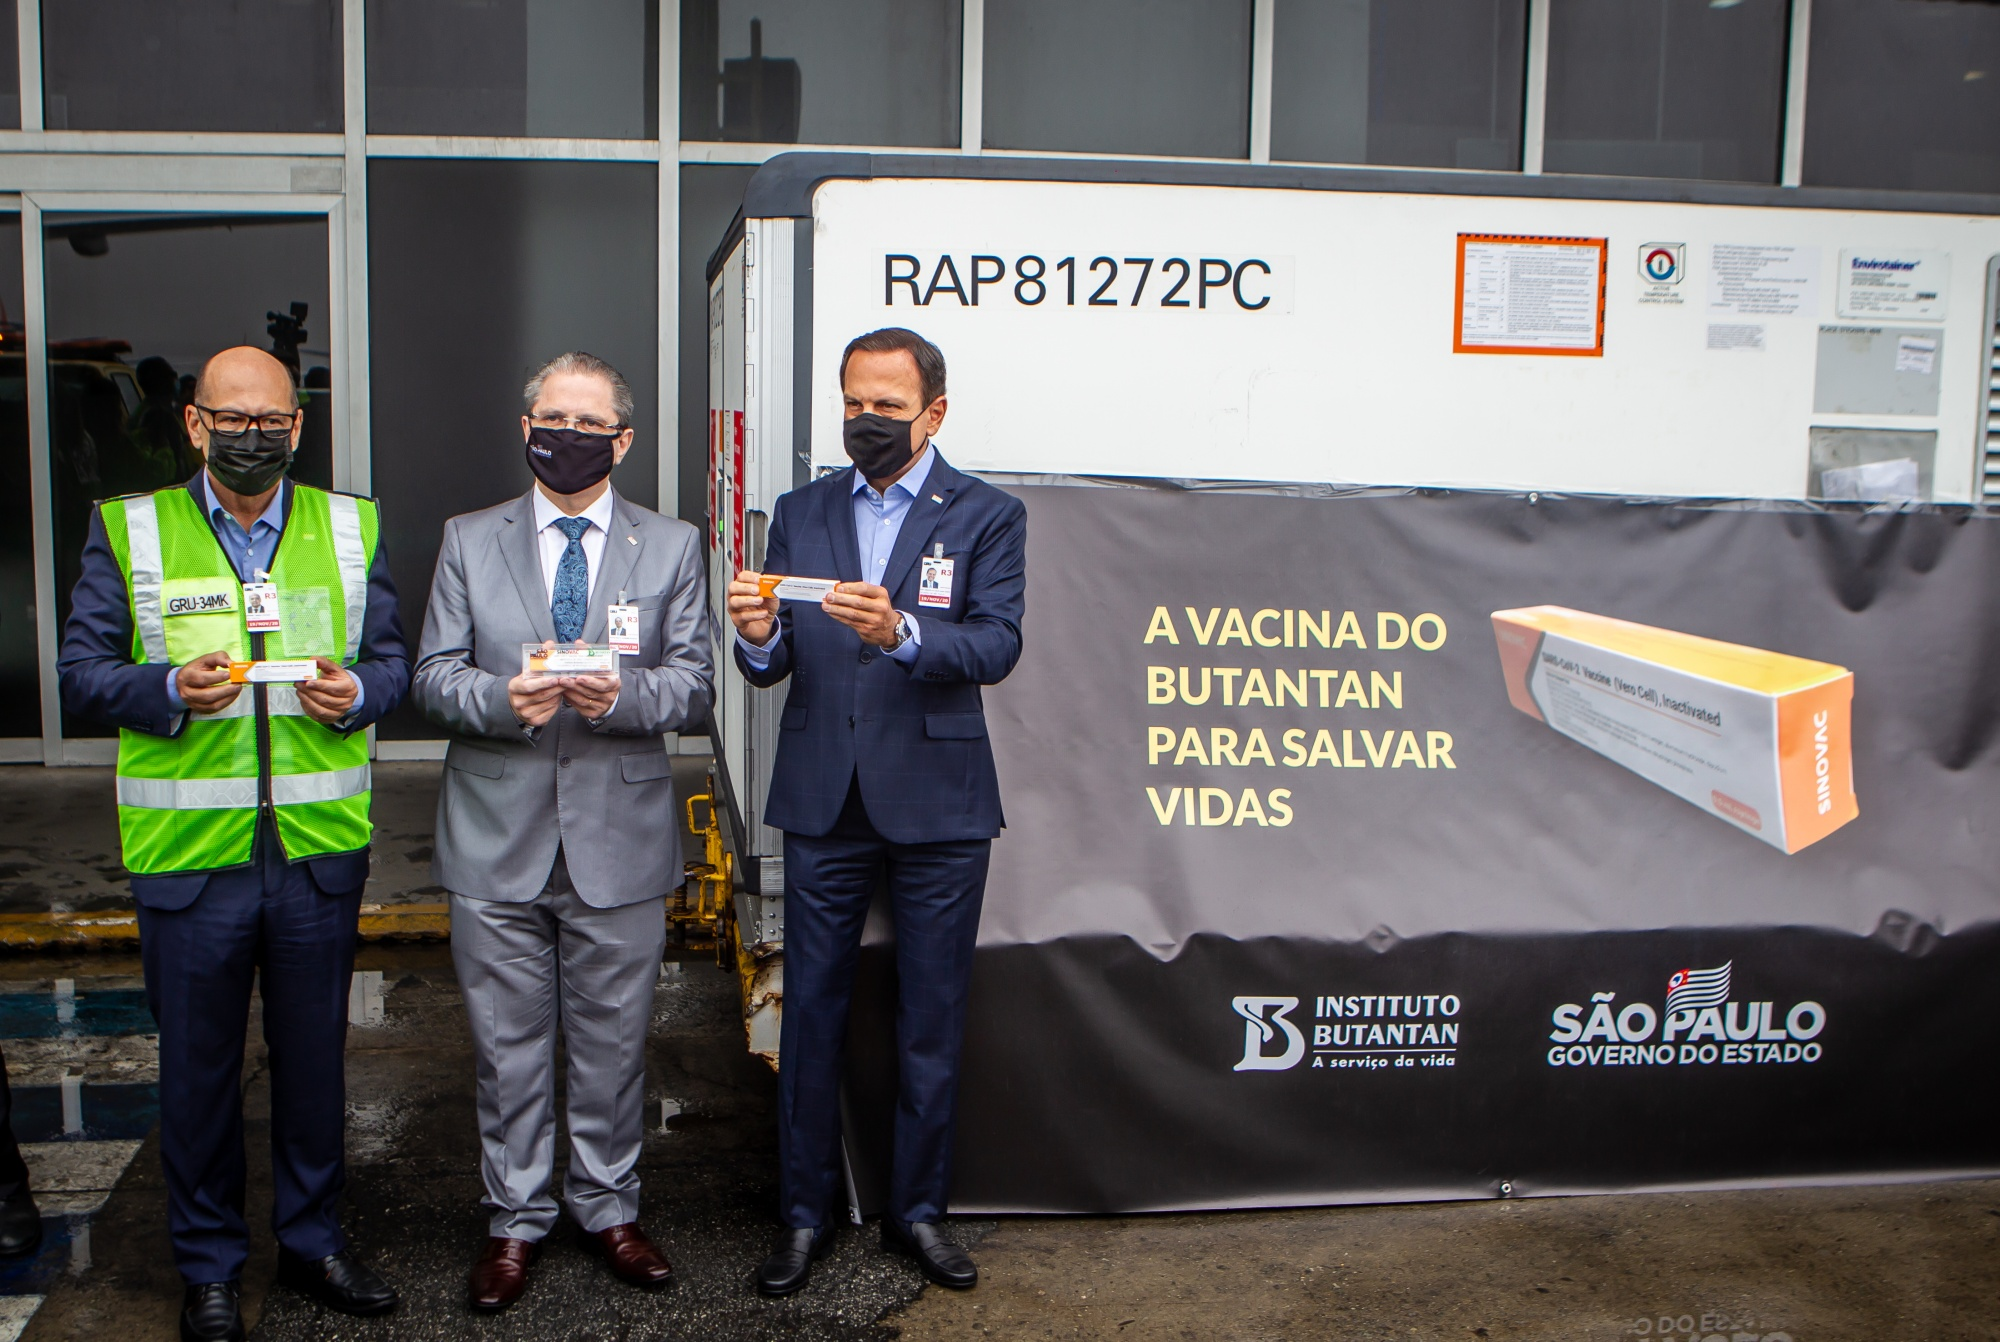 Synovac Biotech's Coronavirus Vaccine Arrives in Brazil